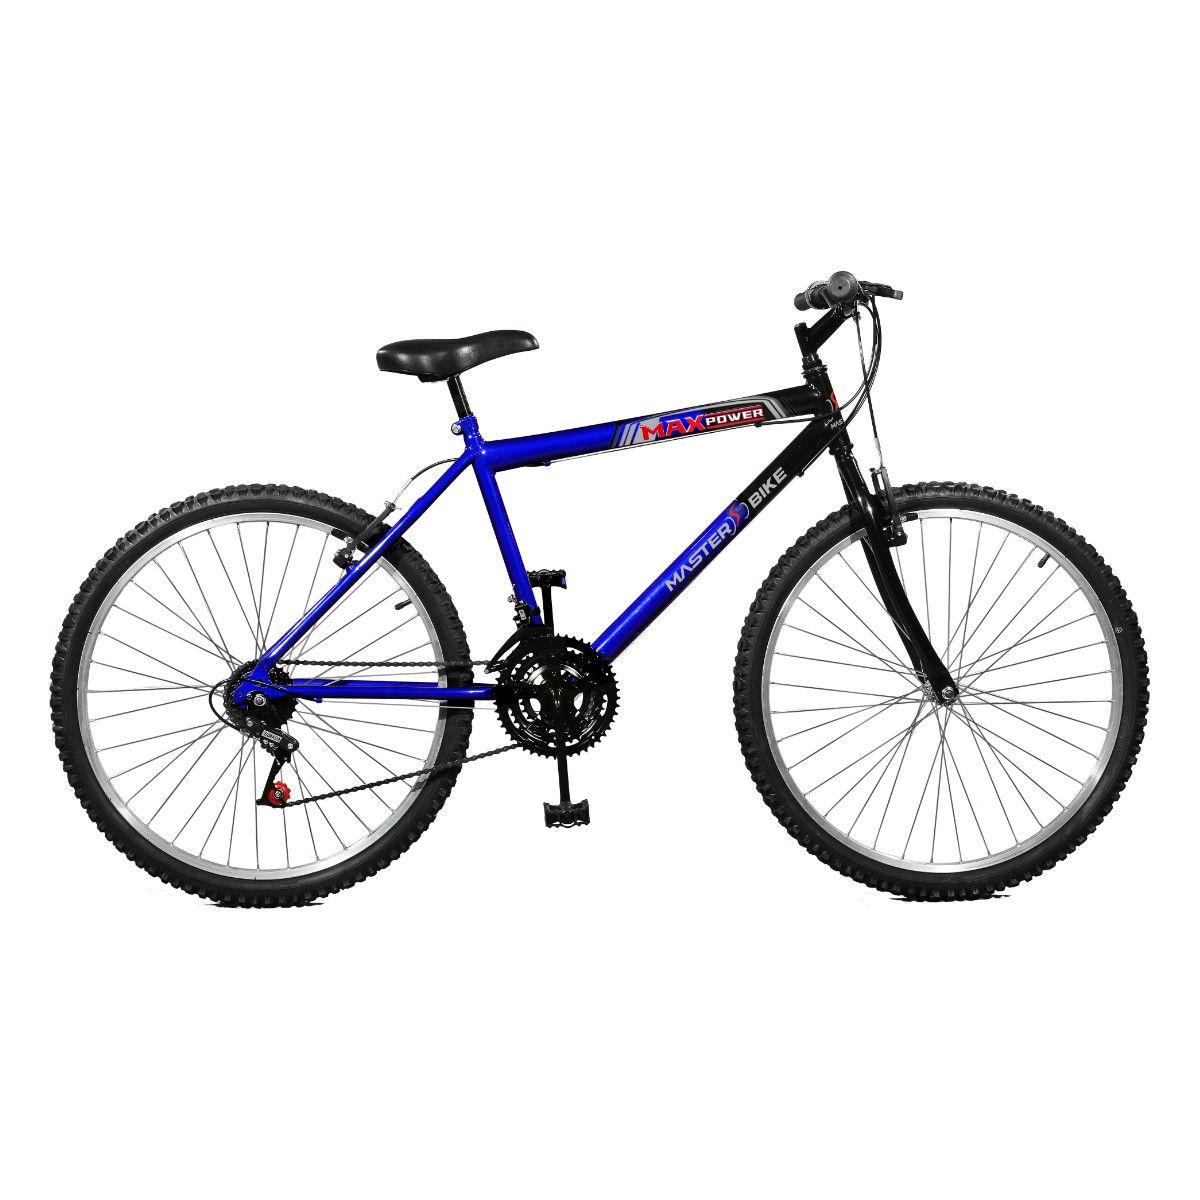 Bicicleta Master Bike Aro 26 Max Power 18 Marchas V-Brake Azul/Preto